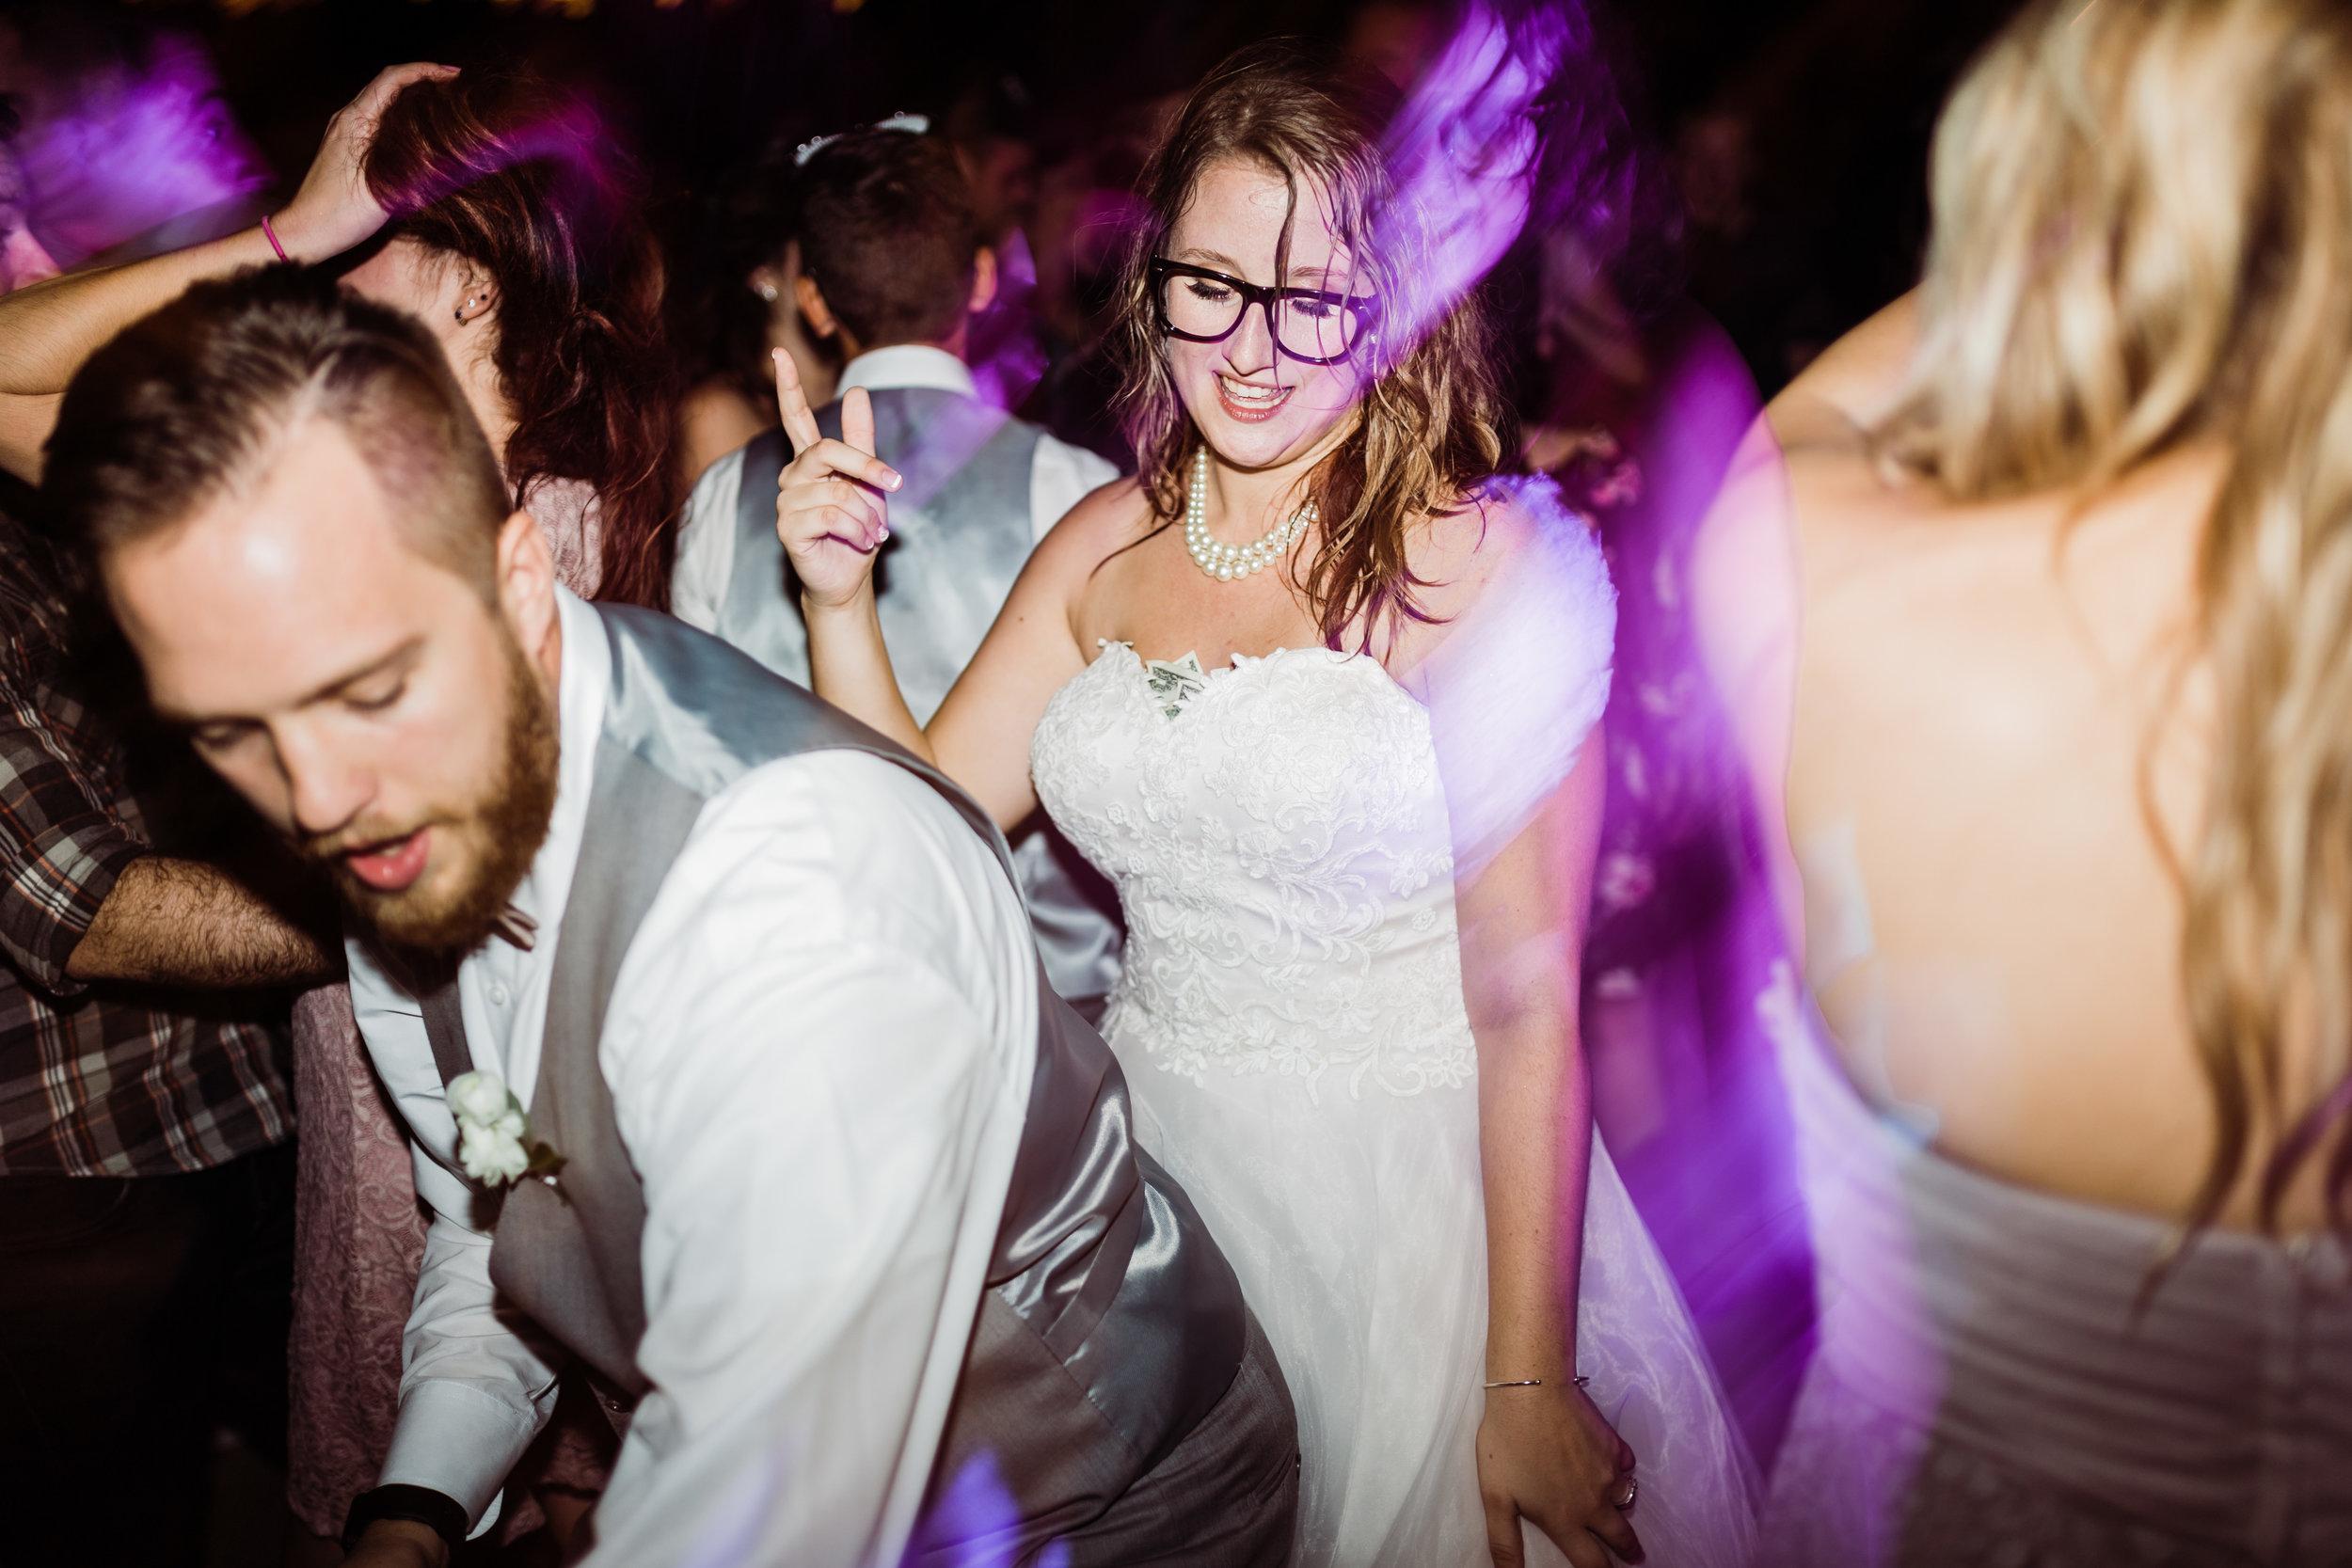 2017.10.14 Samantha and Matthew Crabtree Sarasota Wedding (696 of 708).jpg